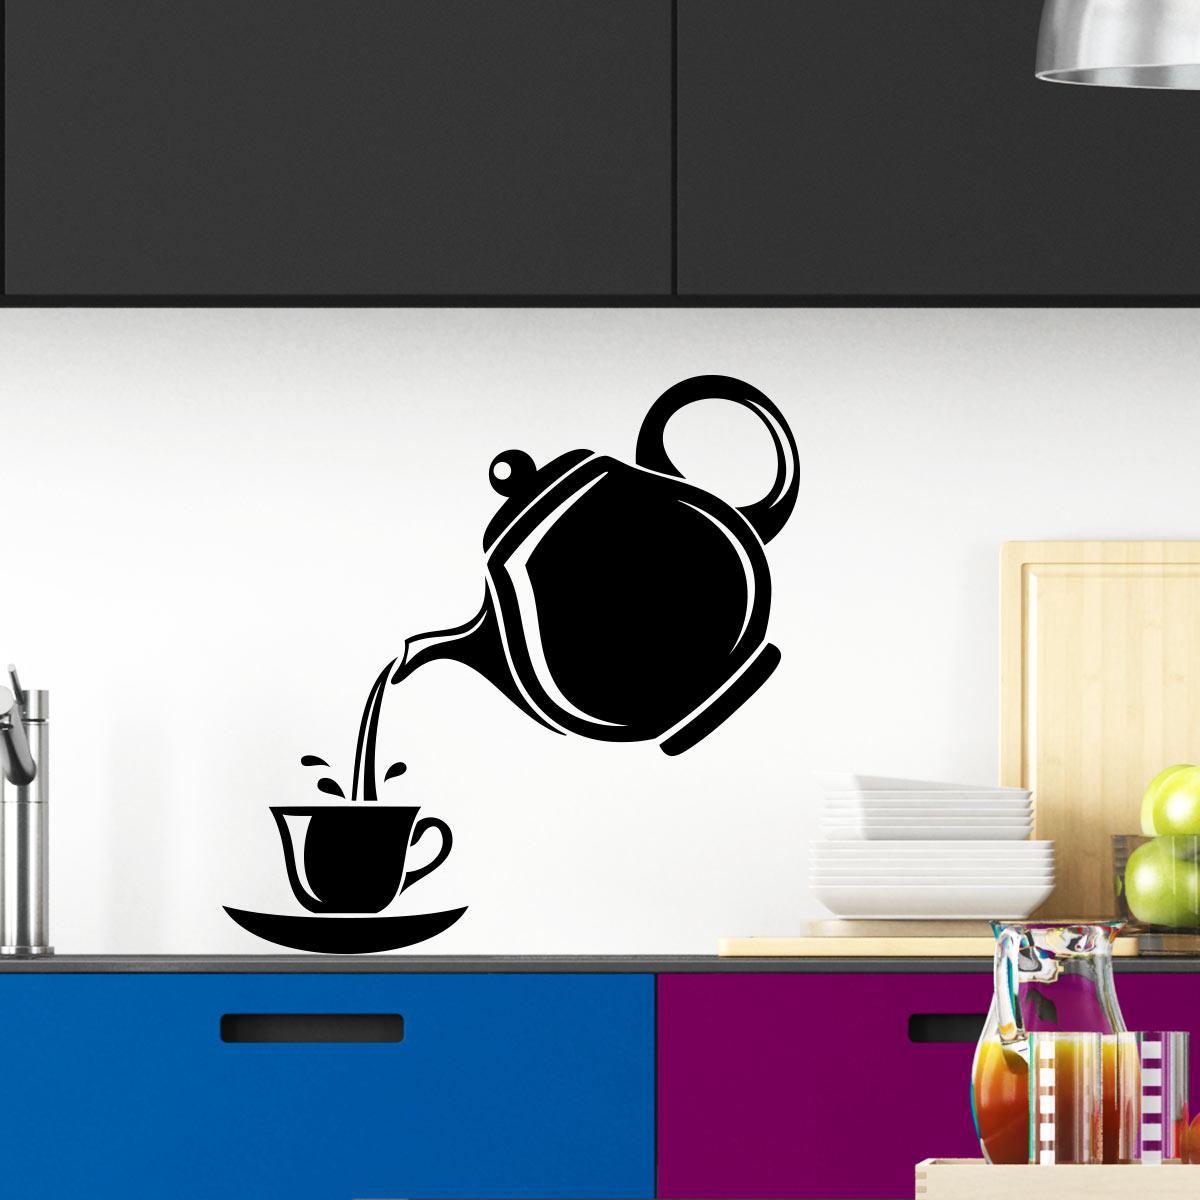 Sticker th i re et tasse stickers muraux pour la cuisine Stickers pour la cuisine